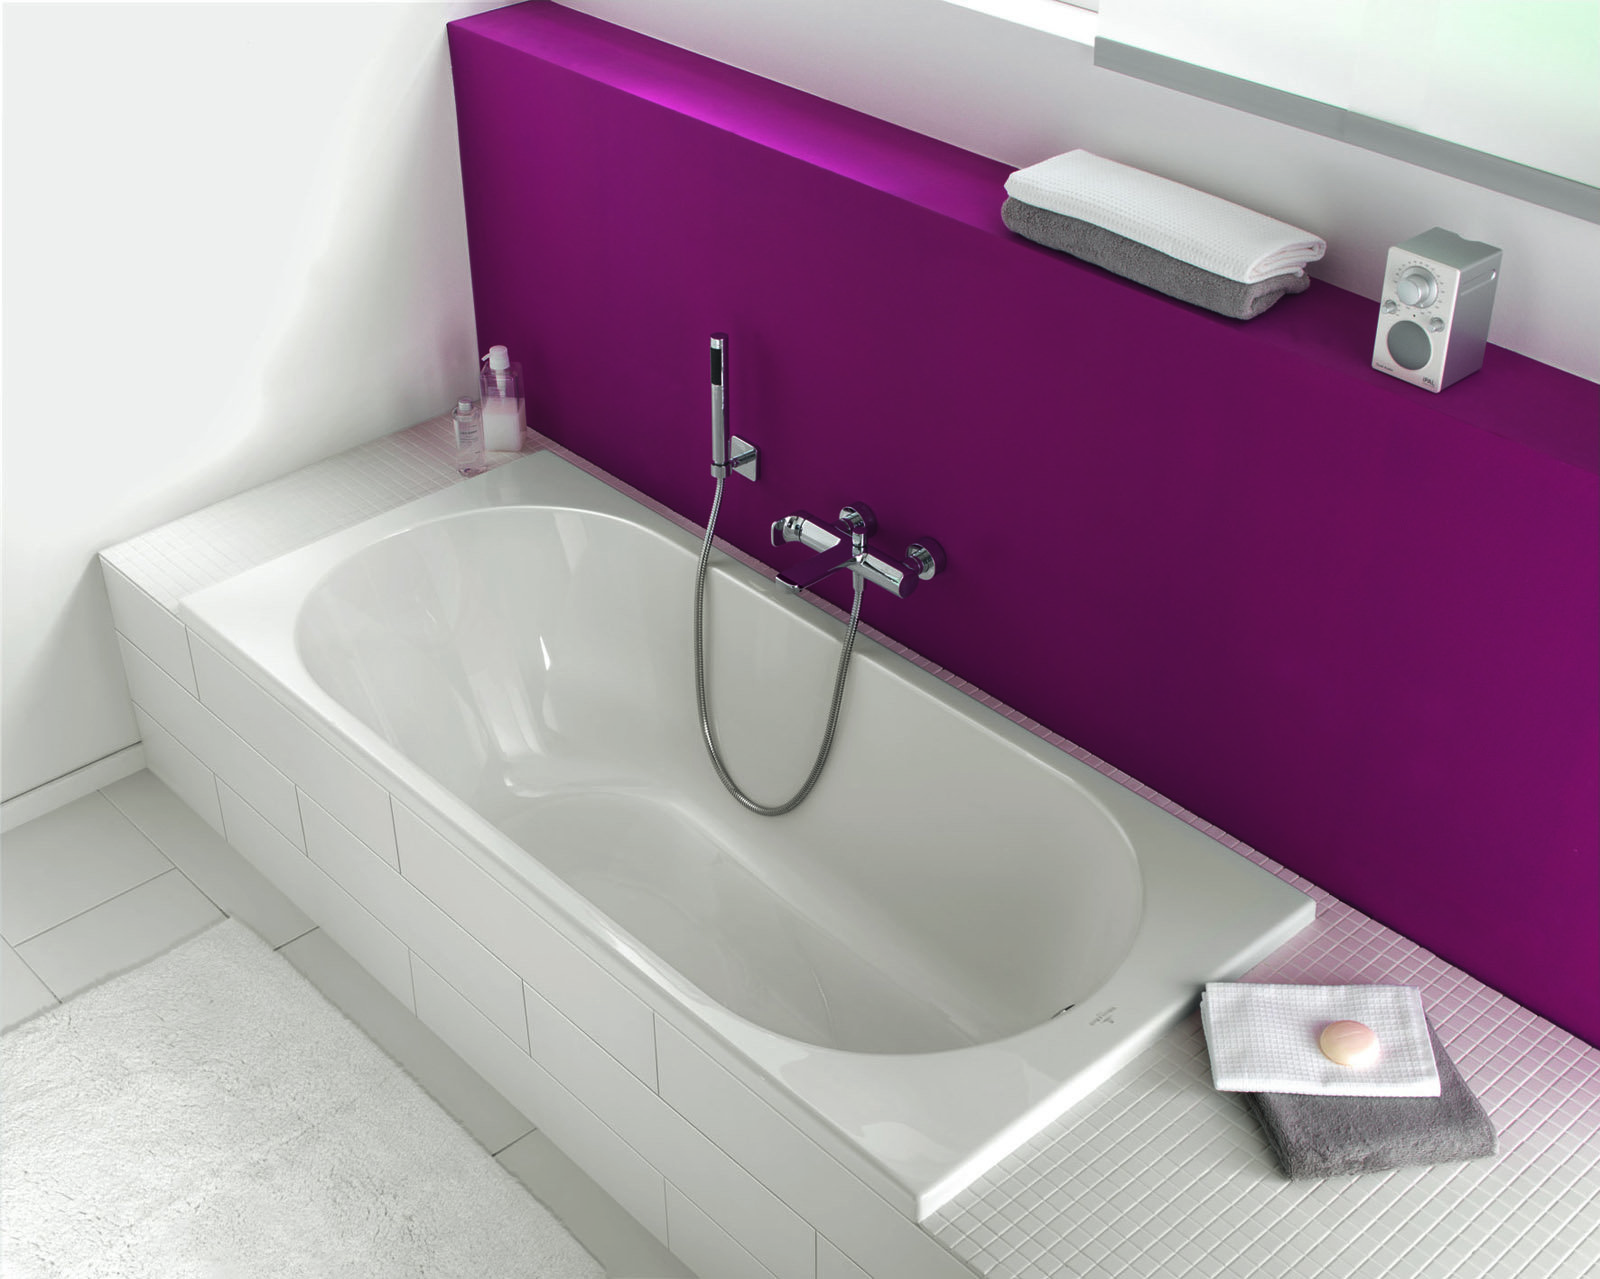 Vasche da bagno low cost a partire da 182 euro cose di casa - Vasche da bagno piccole dimensioni ...